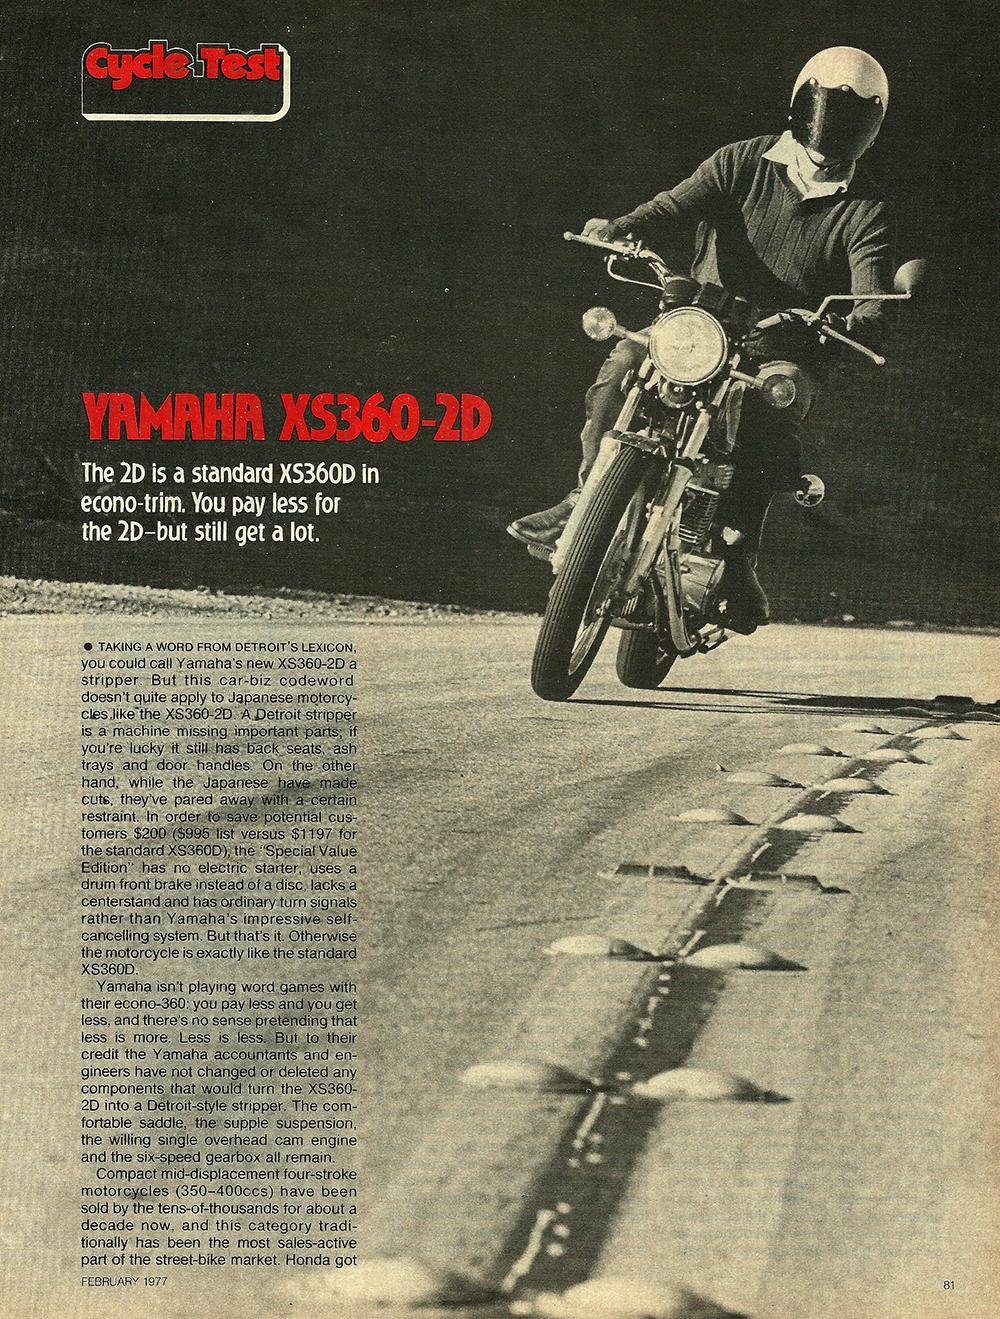 1977 Yamaha XS360-2D road test 1.jpg